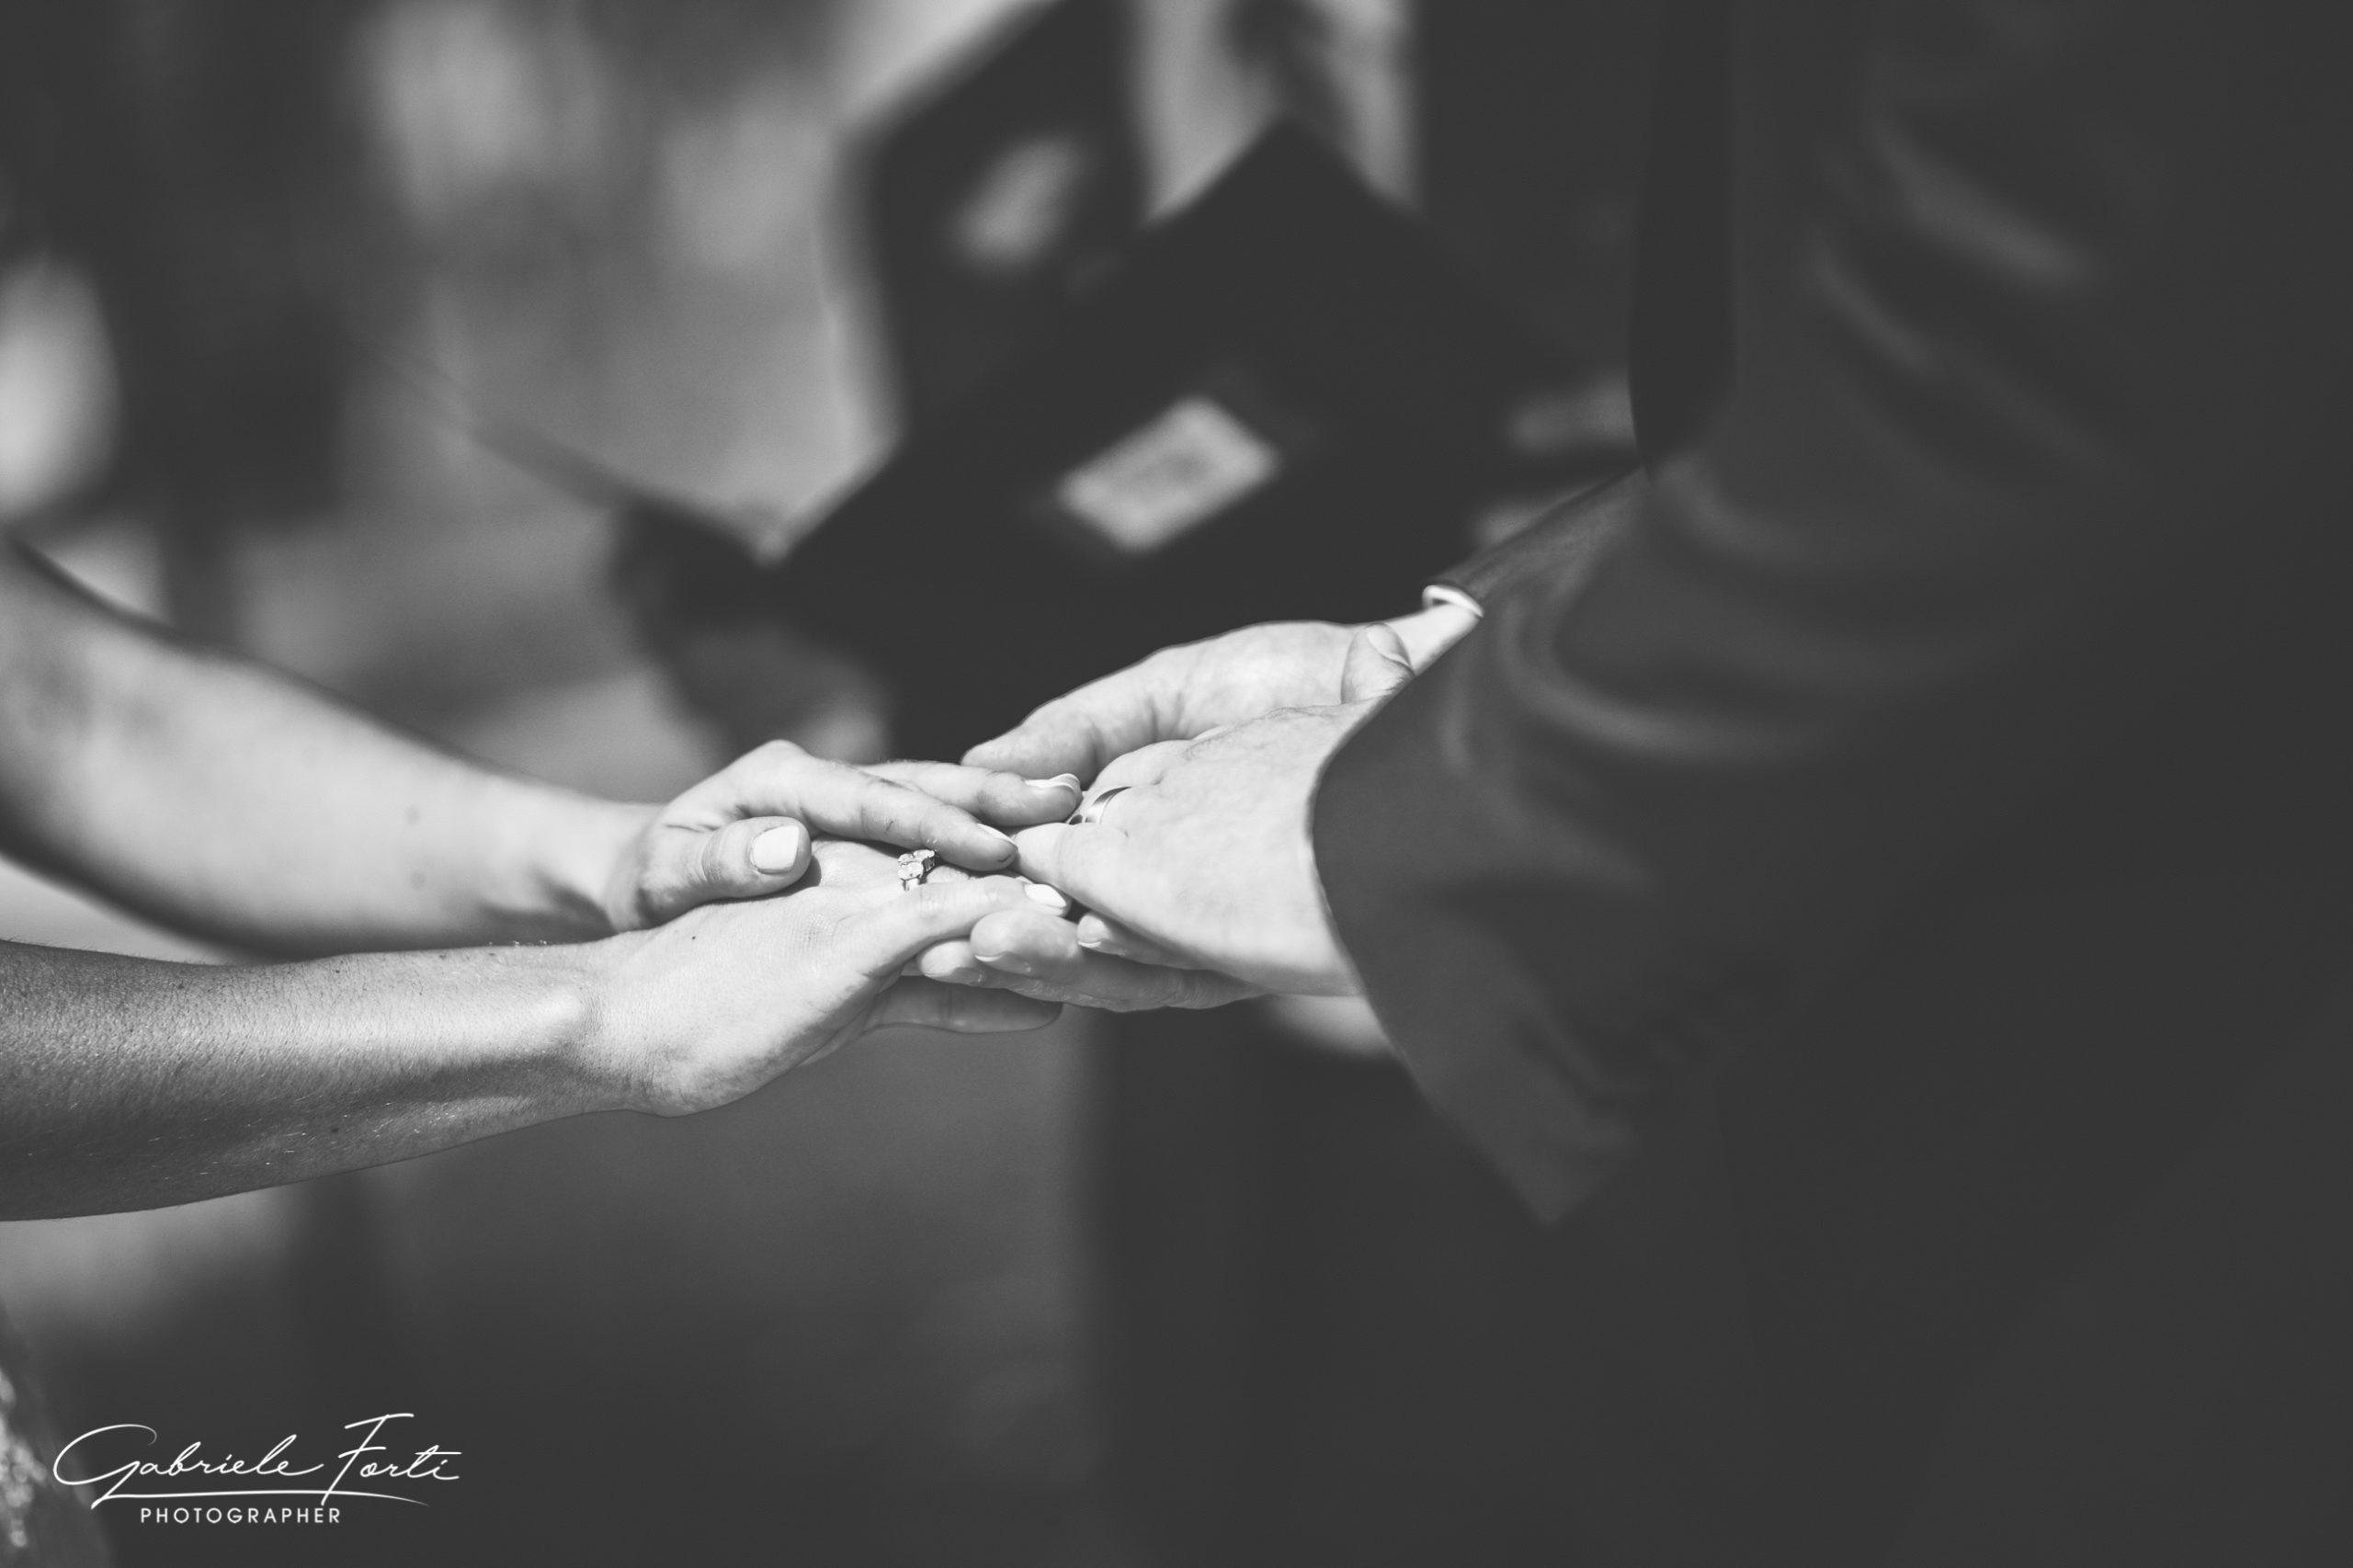 wedding-cortona-tuscany-italy-photographer-foto-forti-gabriele-3